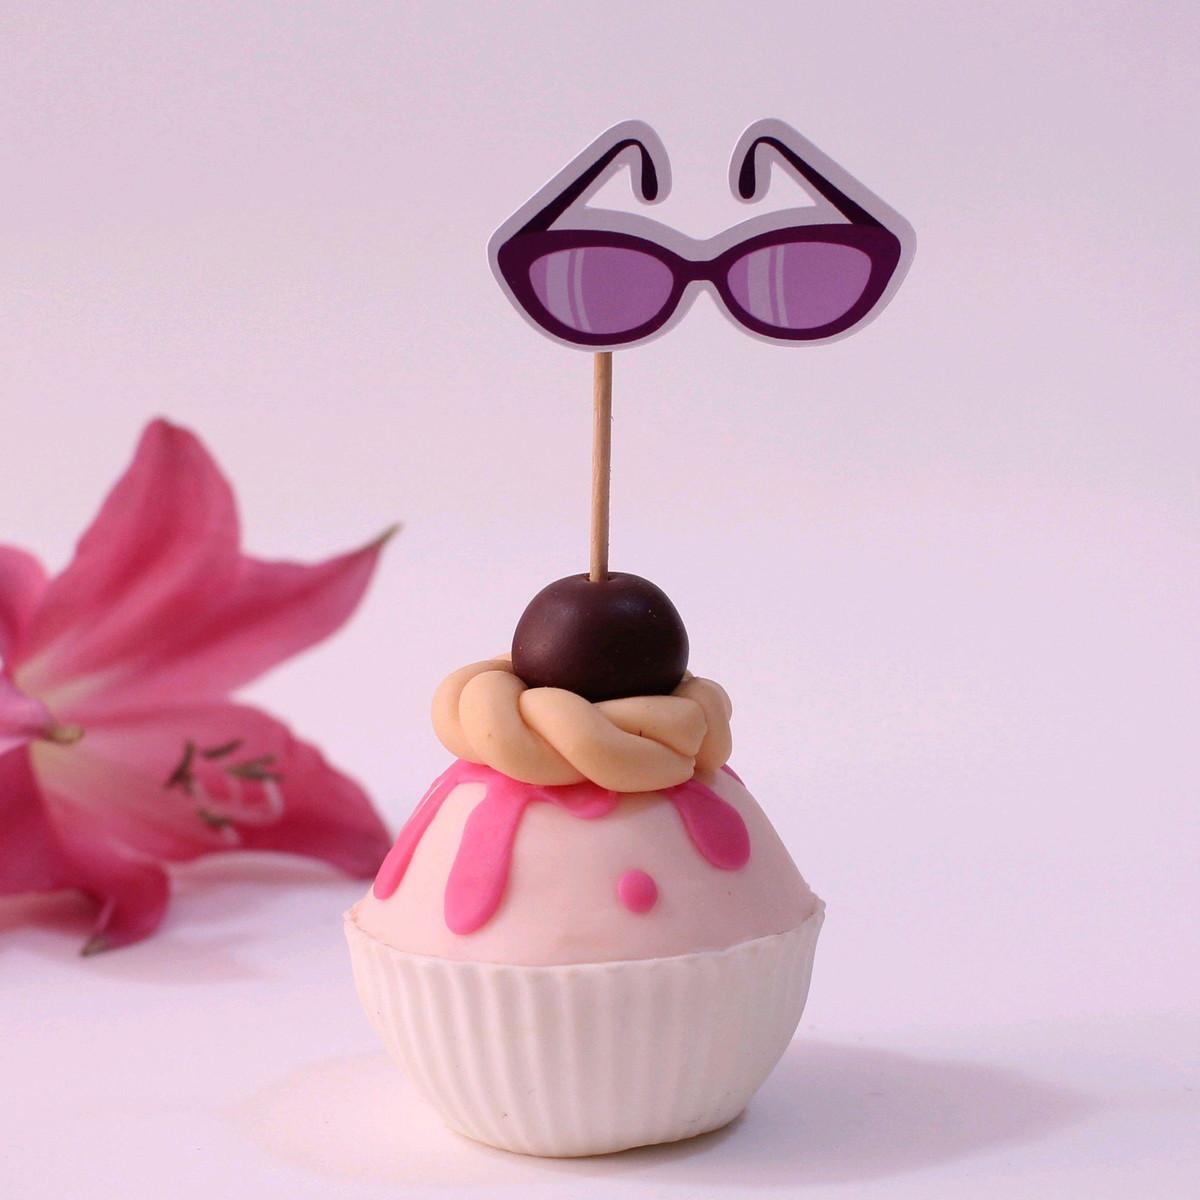 e50707c91efcd Topper para doces - moda - óculos de sol no Elo7   A Carol que fez ...